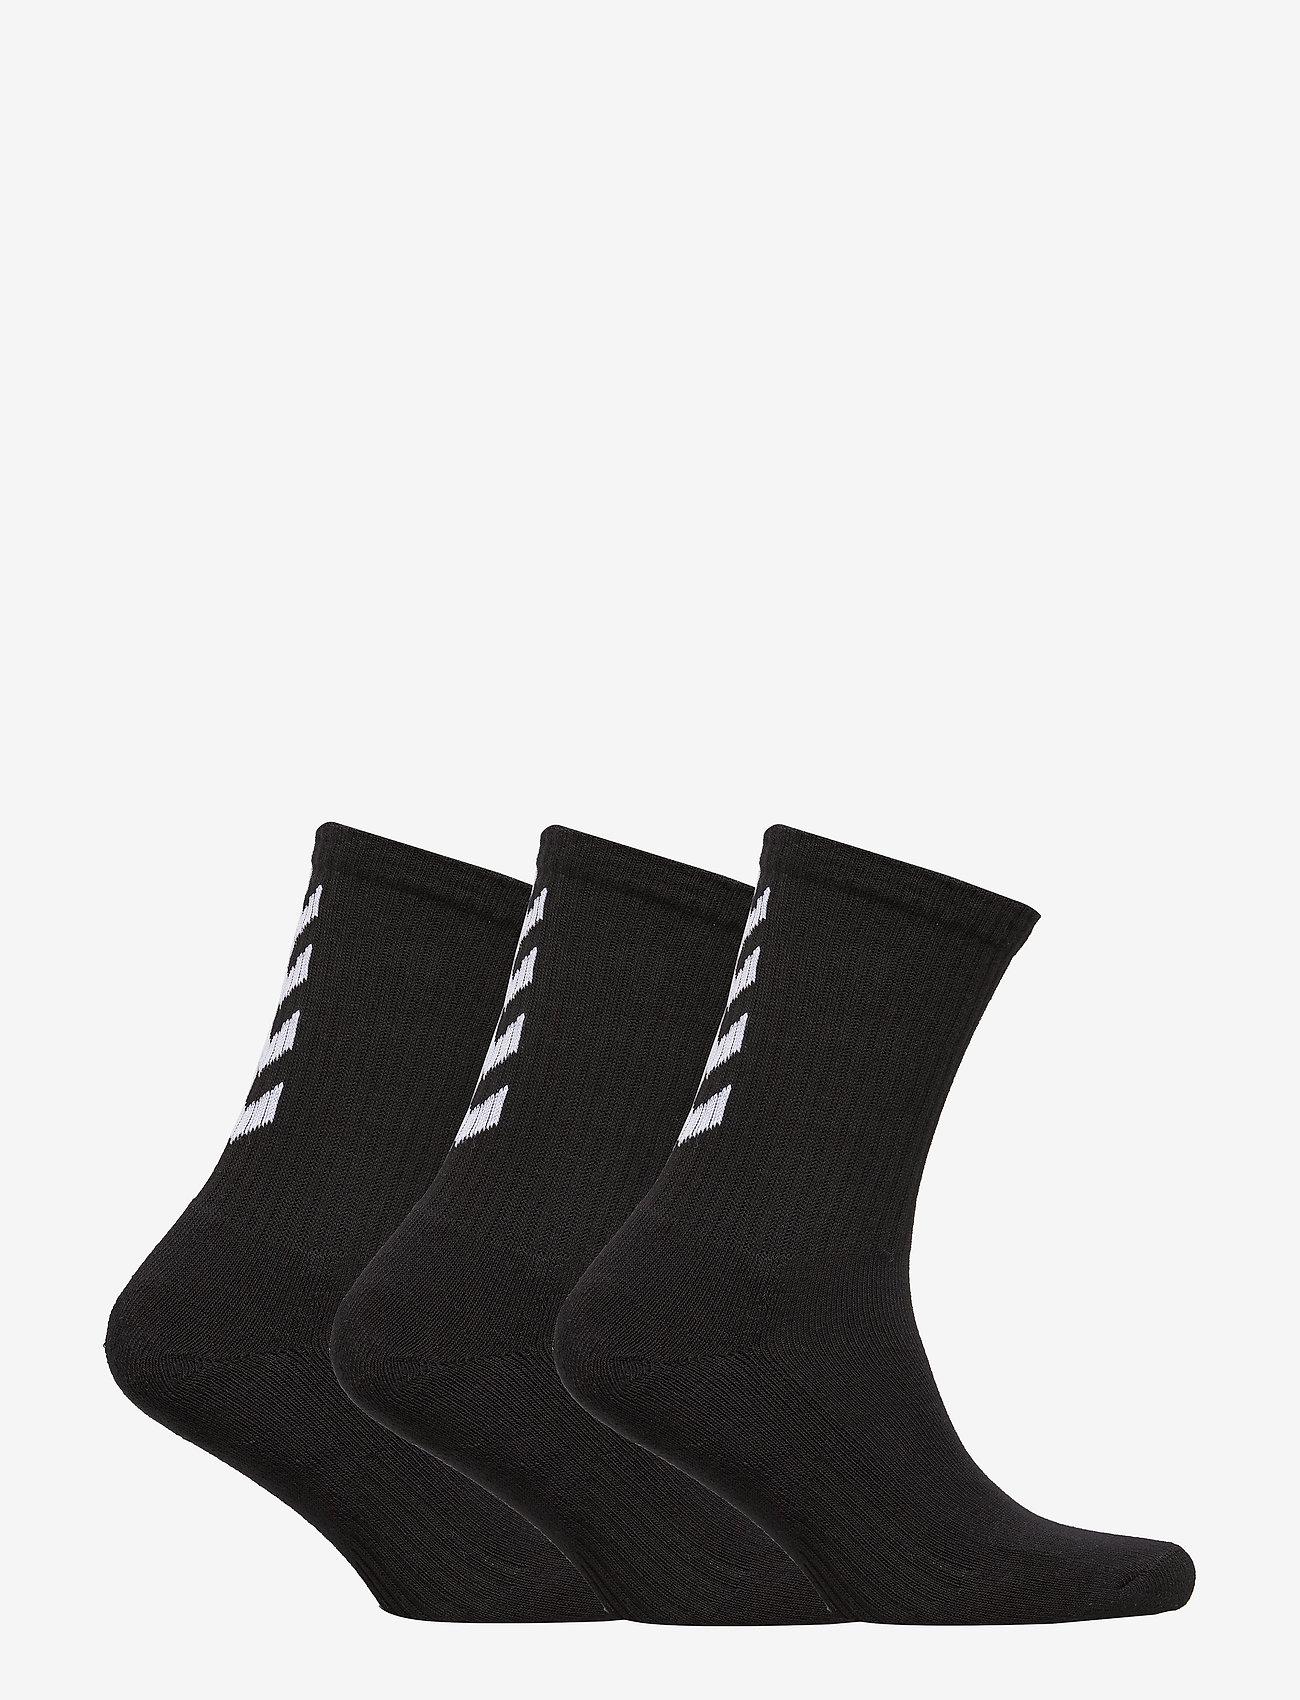 Hummel - FUNDAMENTAL 3-PACK SOCK - sokker - black - 1